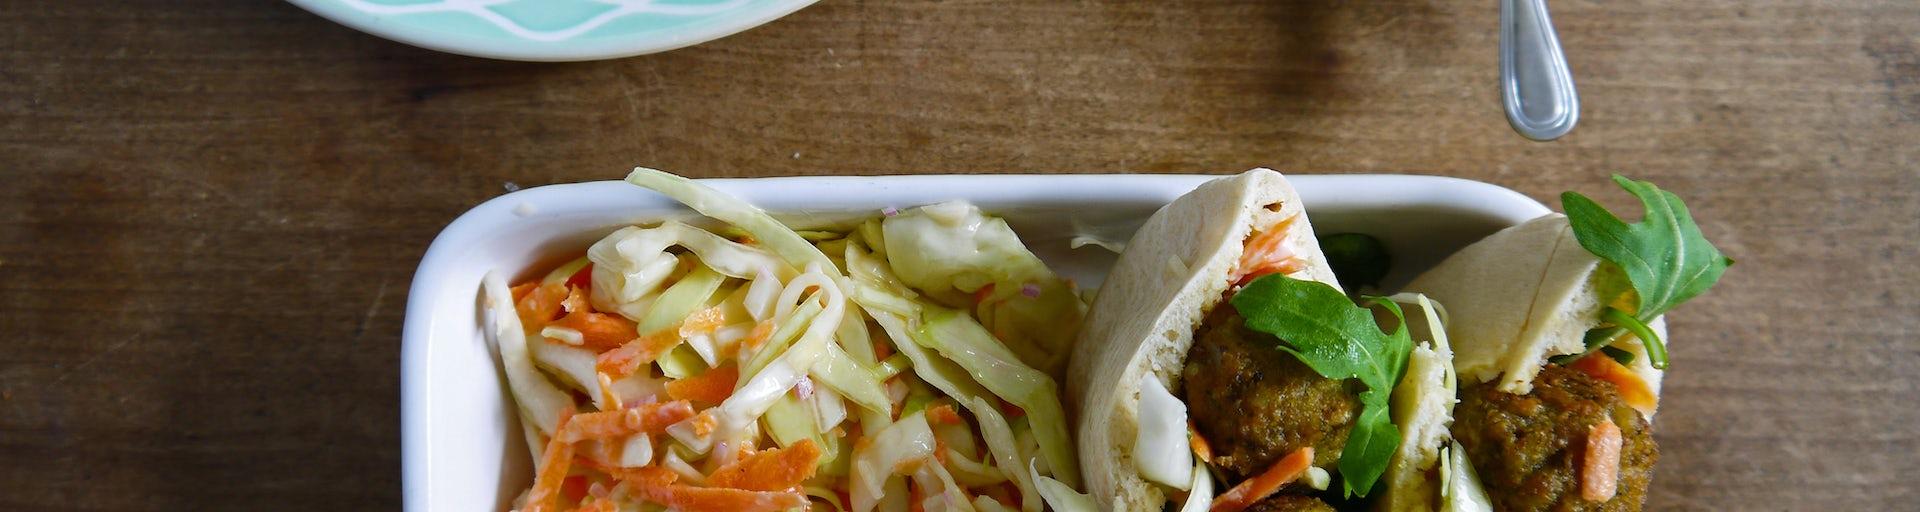 Wk 38 pita falafel balletjes coleslaw bieten rucola yoghurt